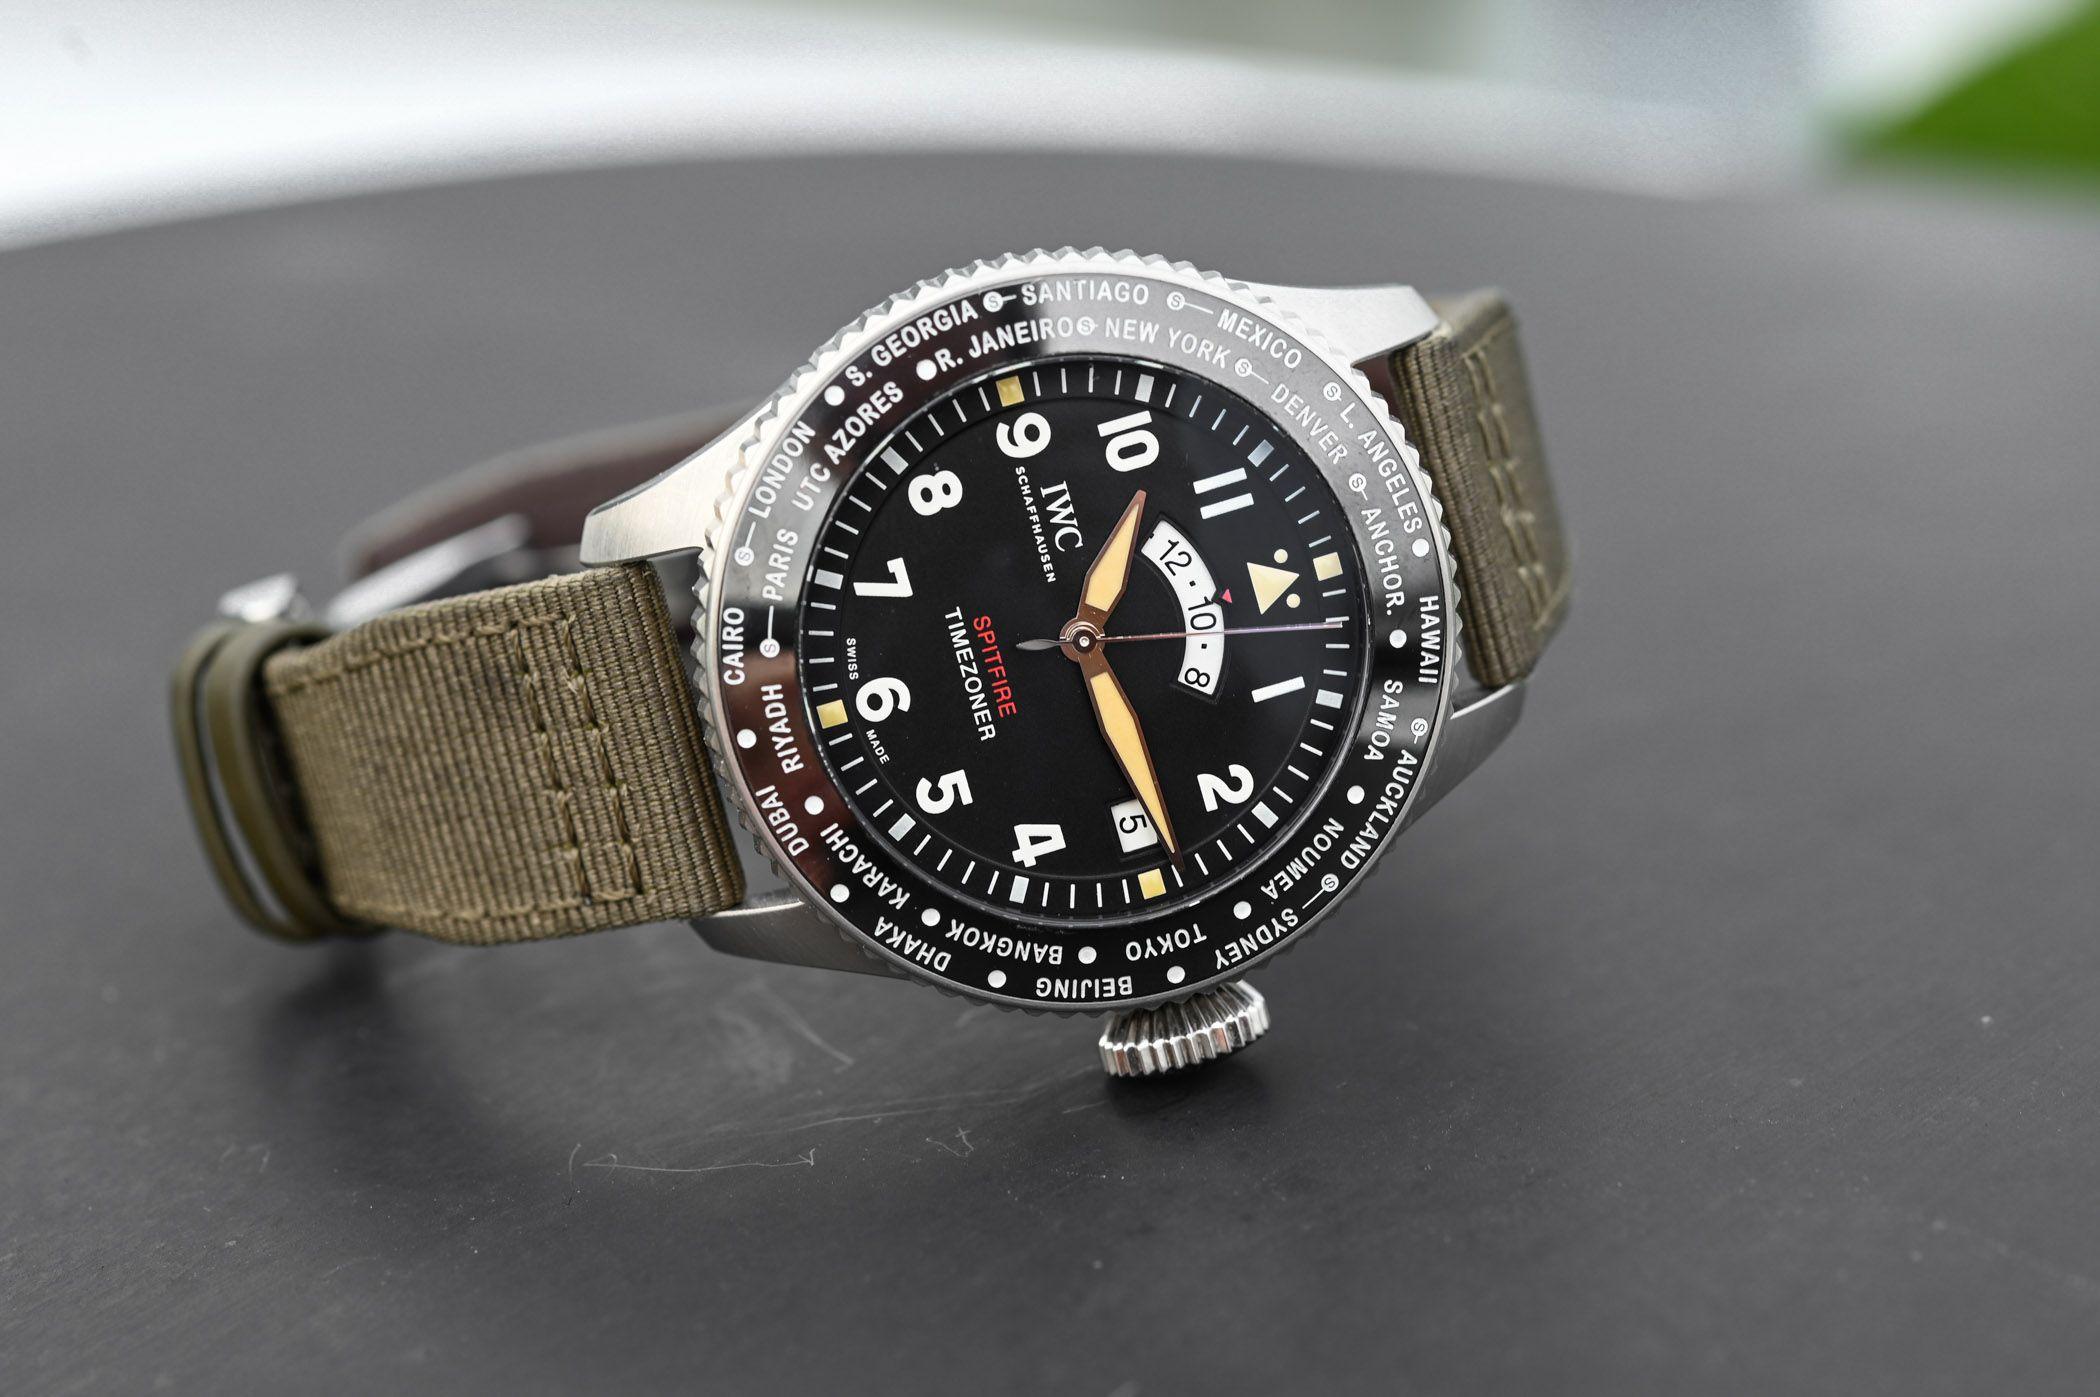 d28b1945843 IWC Pilots Watch Timezoner Spitfire Edition The Longest Flight IW395501 -  SIHH 2019